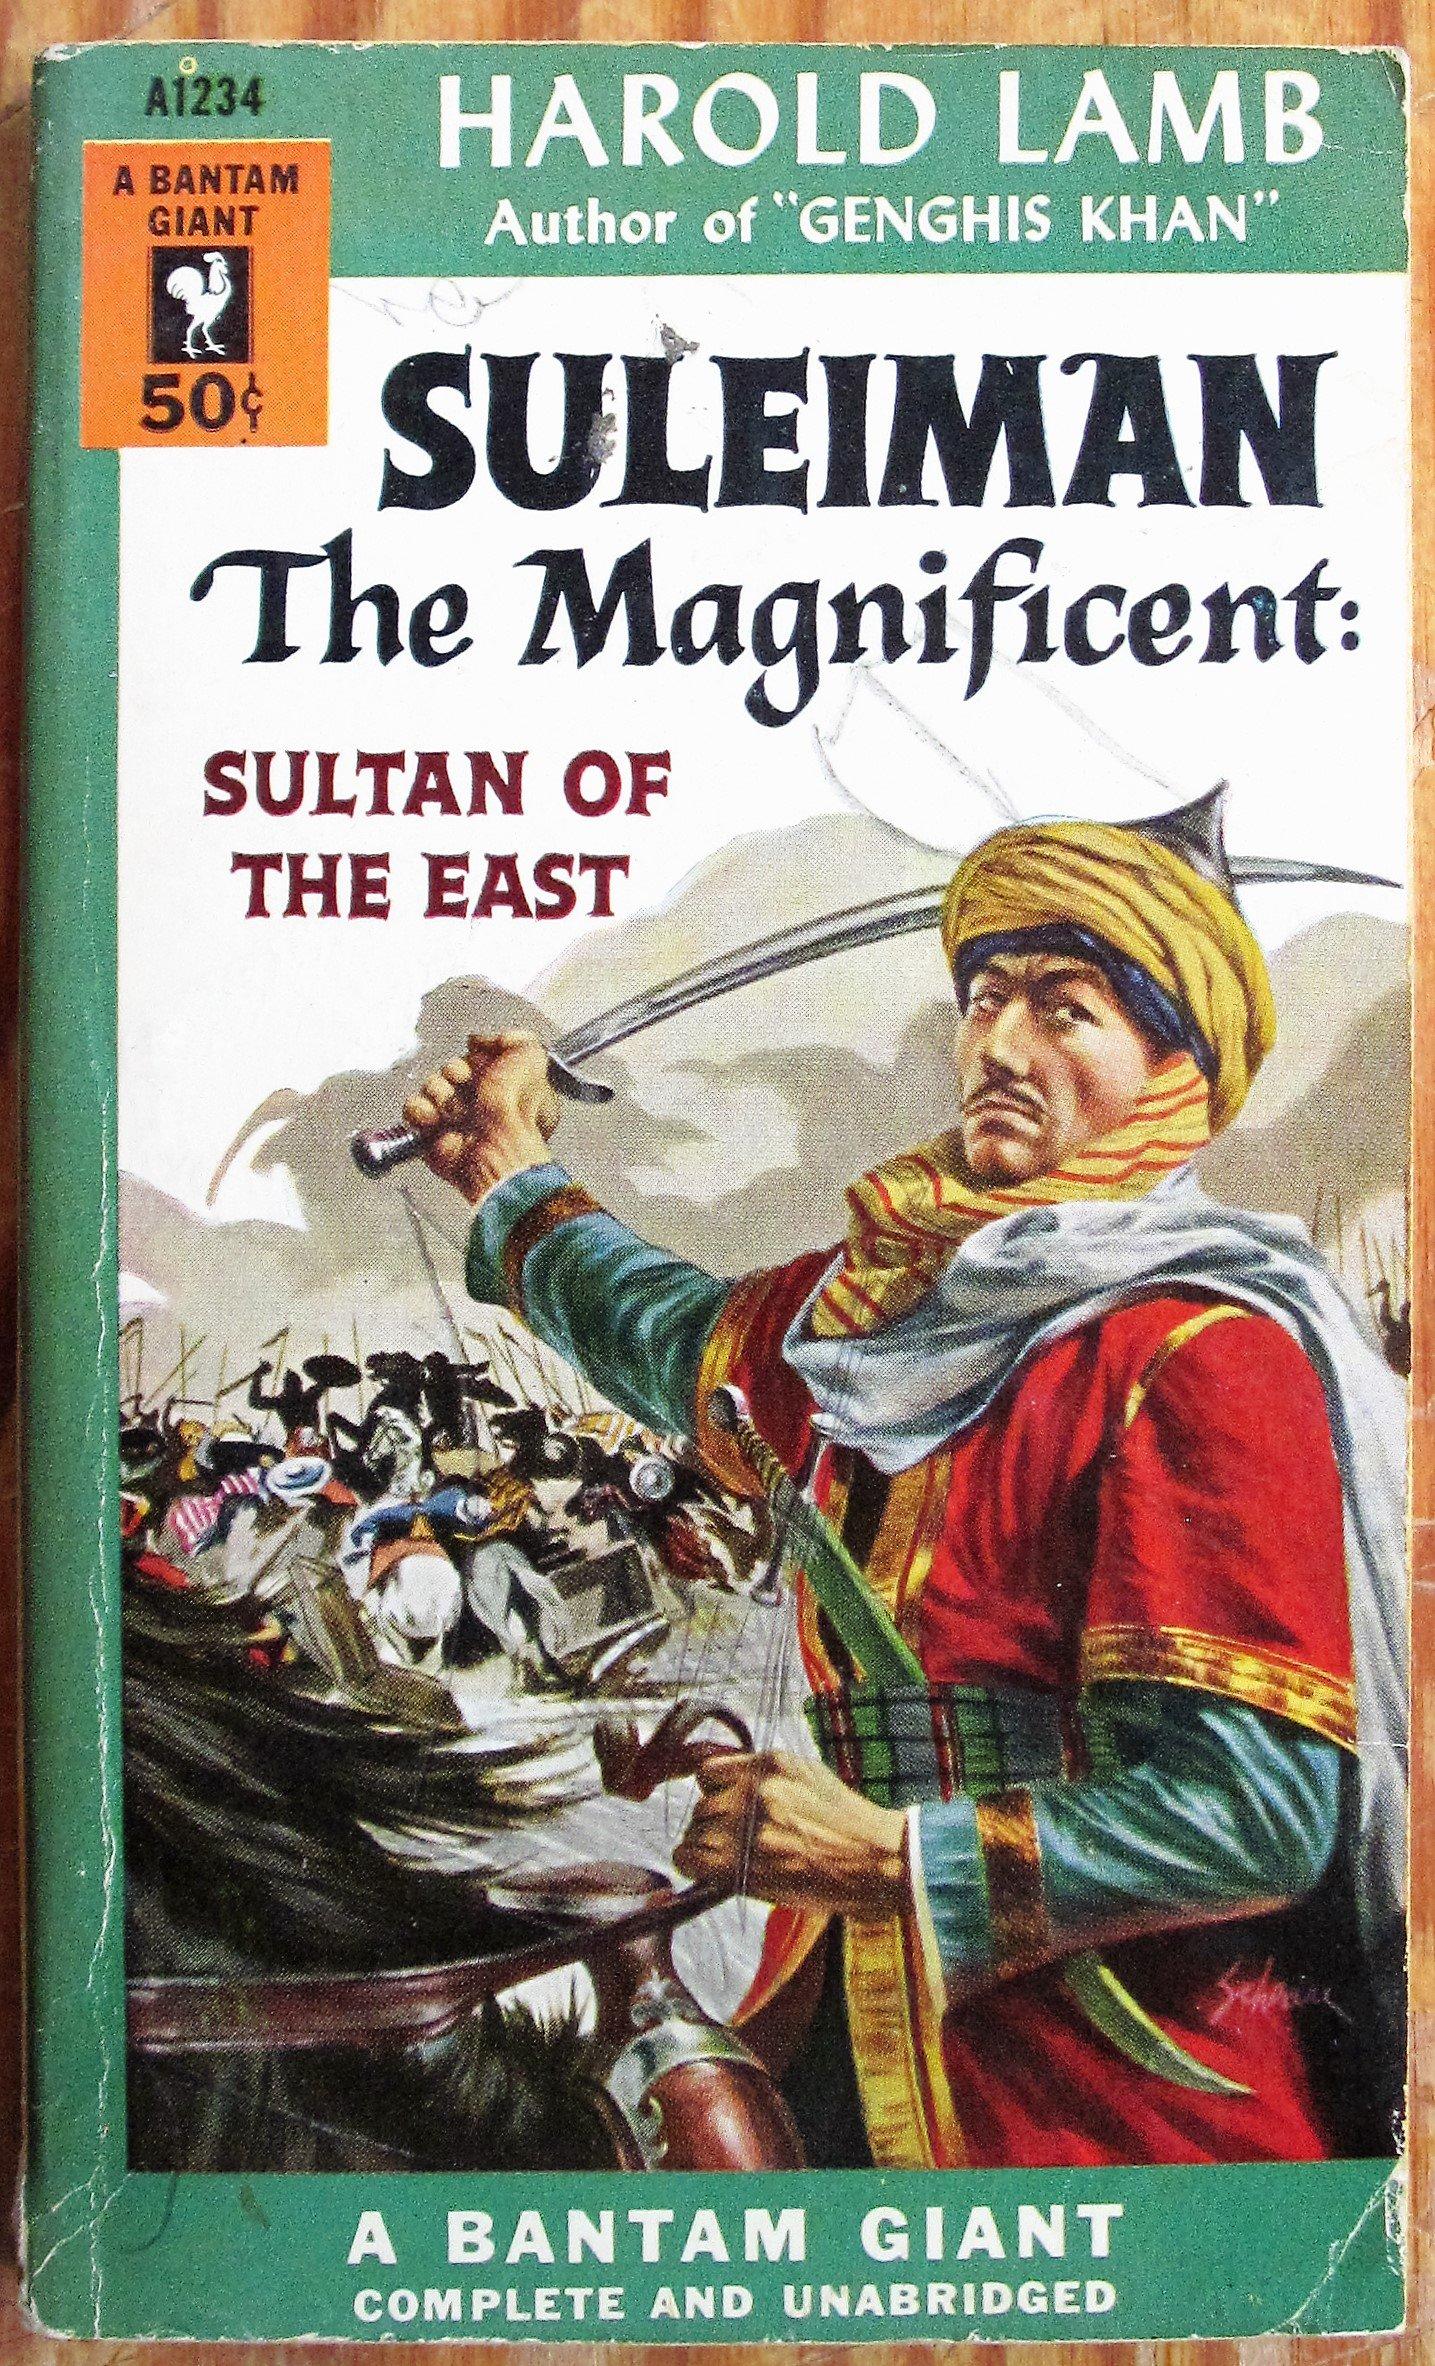 Suleiman The Magnificent: Amazon.co.uk: Harold. Lamb: 9780523402277: Books